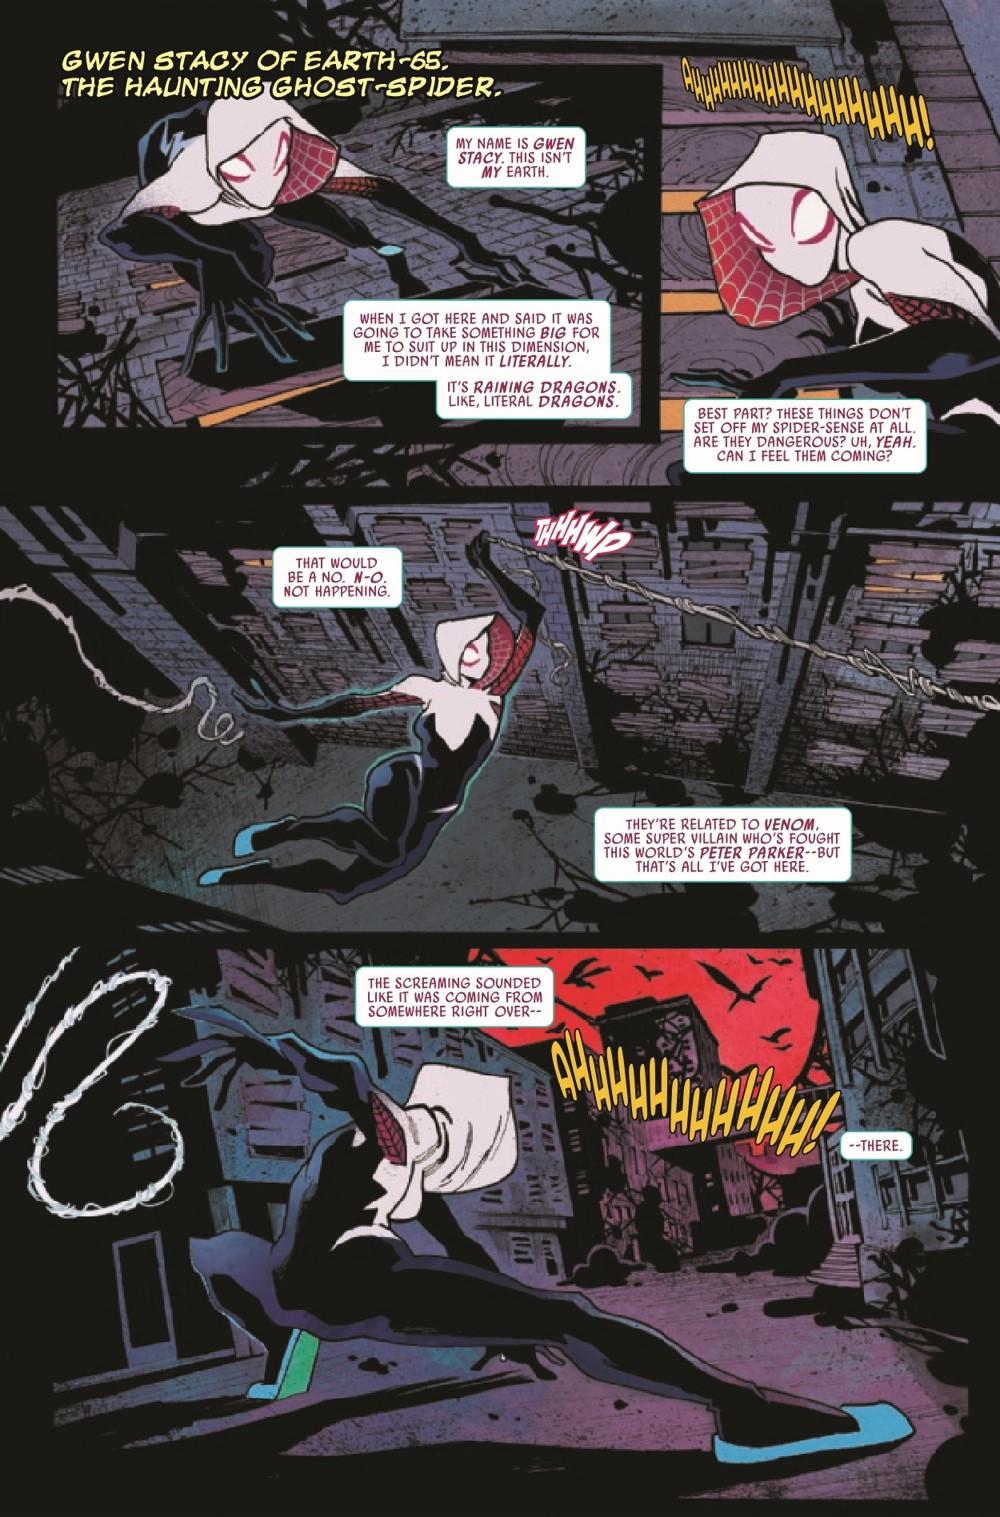 GWENOMVSCARNKIB2021001_Preview-4 ComicList Previews: KING IN BLACK GWENOM VS CARNAGE #1 (OF 3)